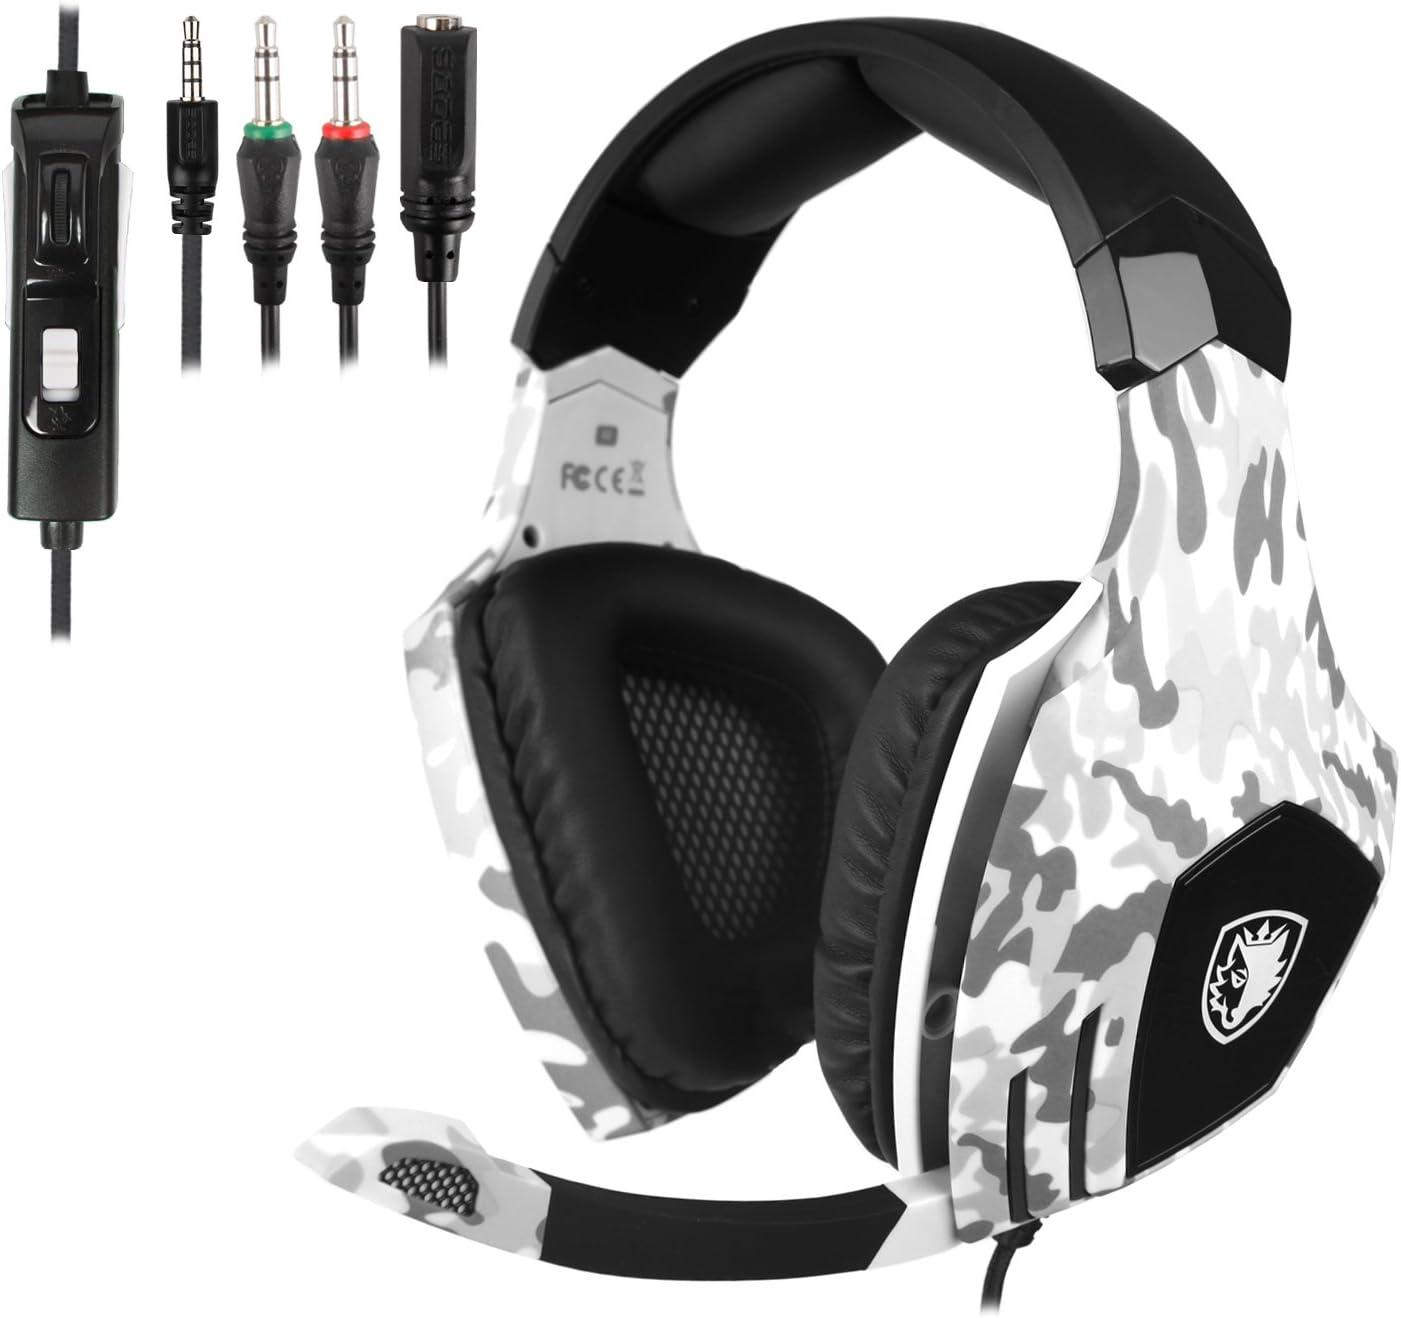 Free Amazon Promo Code 2020 for SA618 Surround Sound Gaming Headset